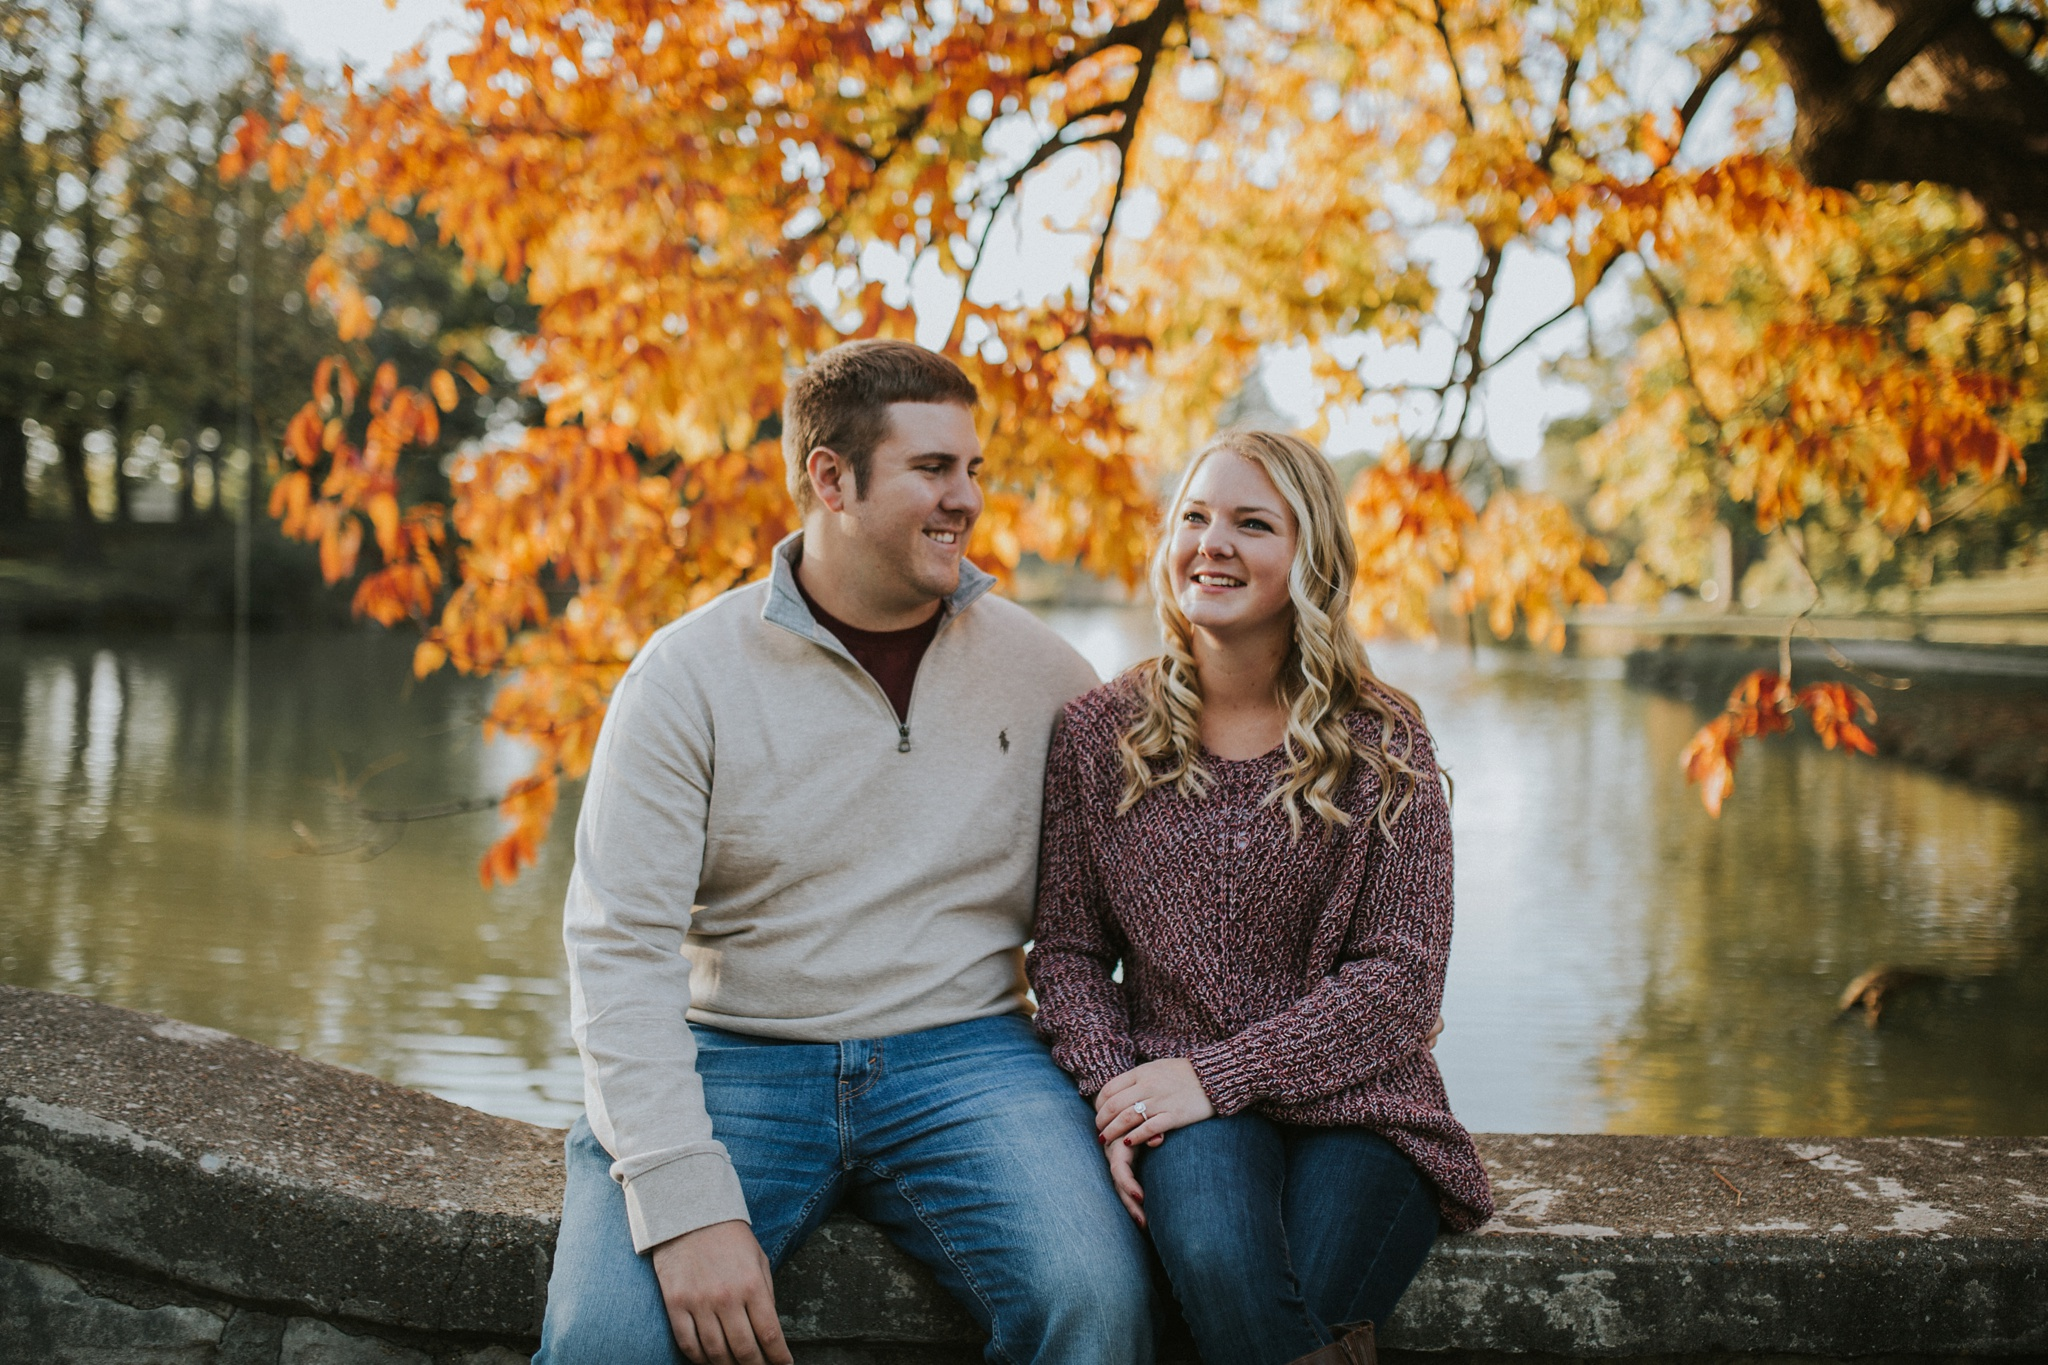 Bosse-Field-Engagement-Photos-Evansville_0017.jpg